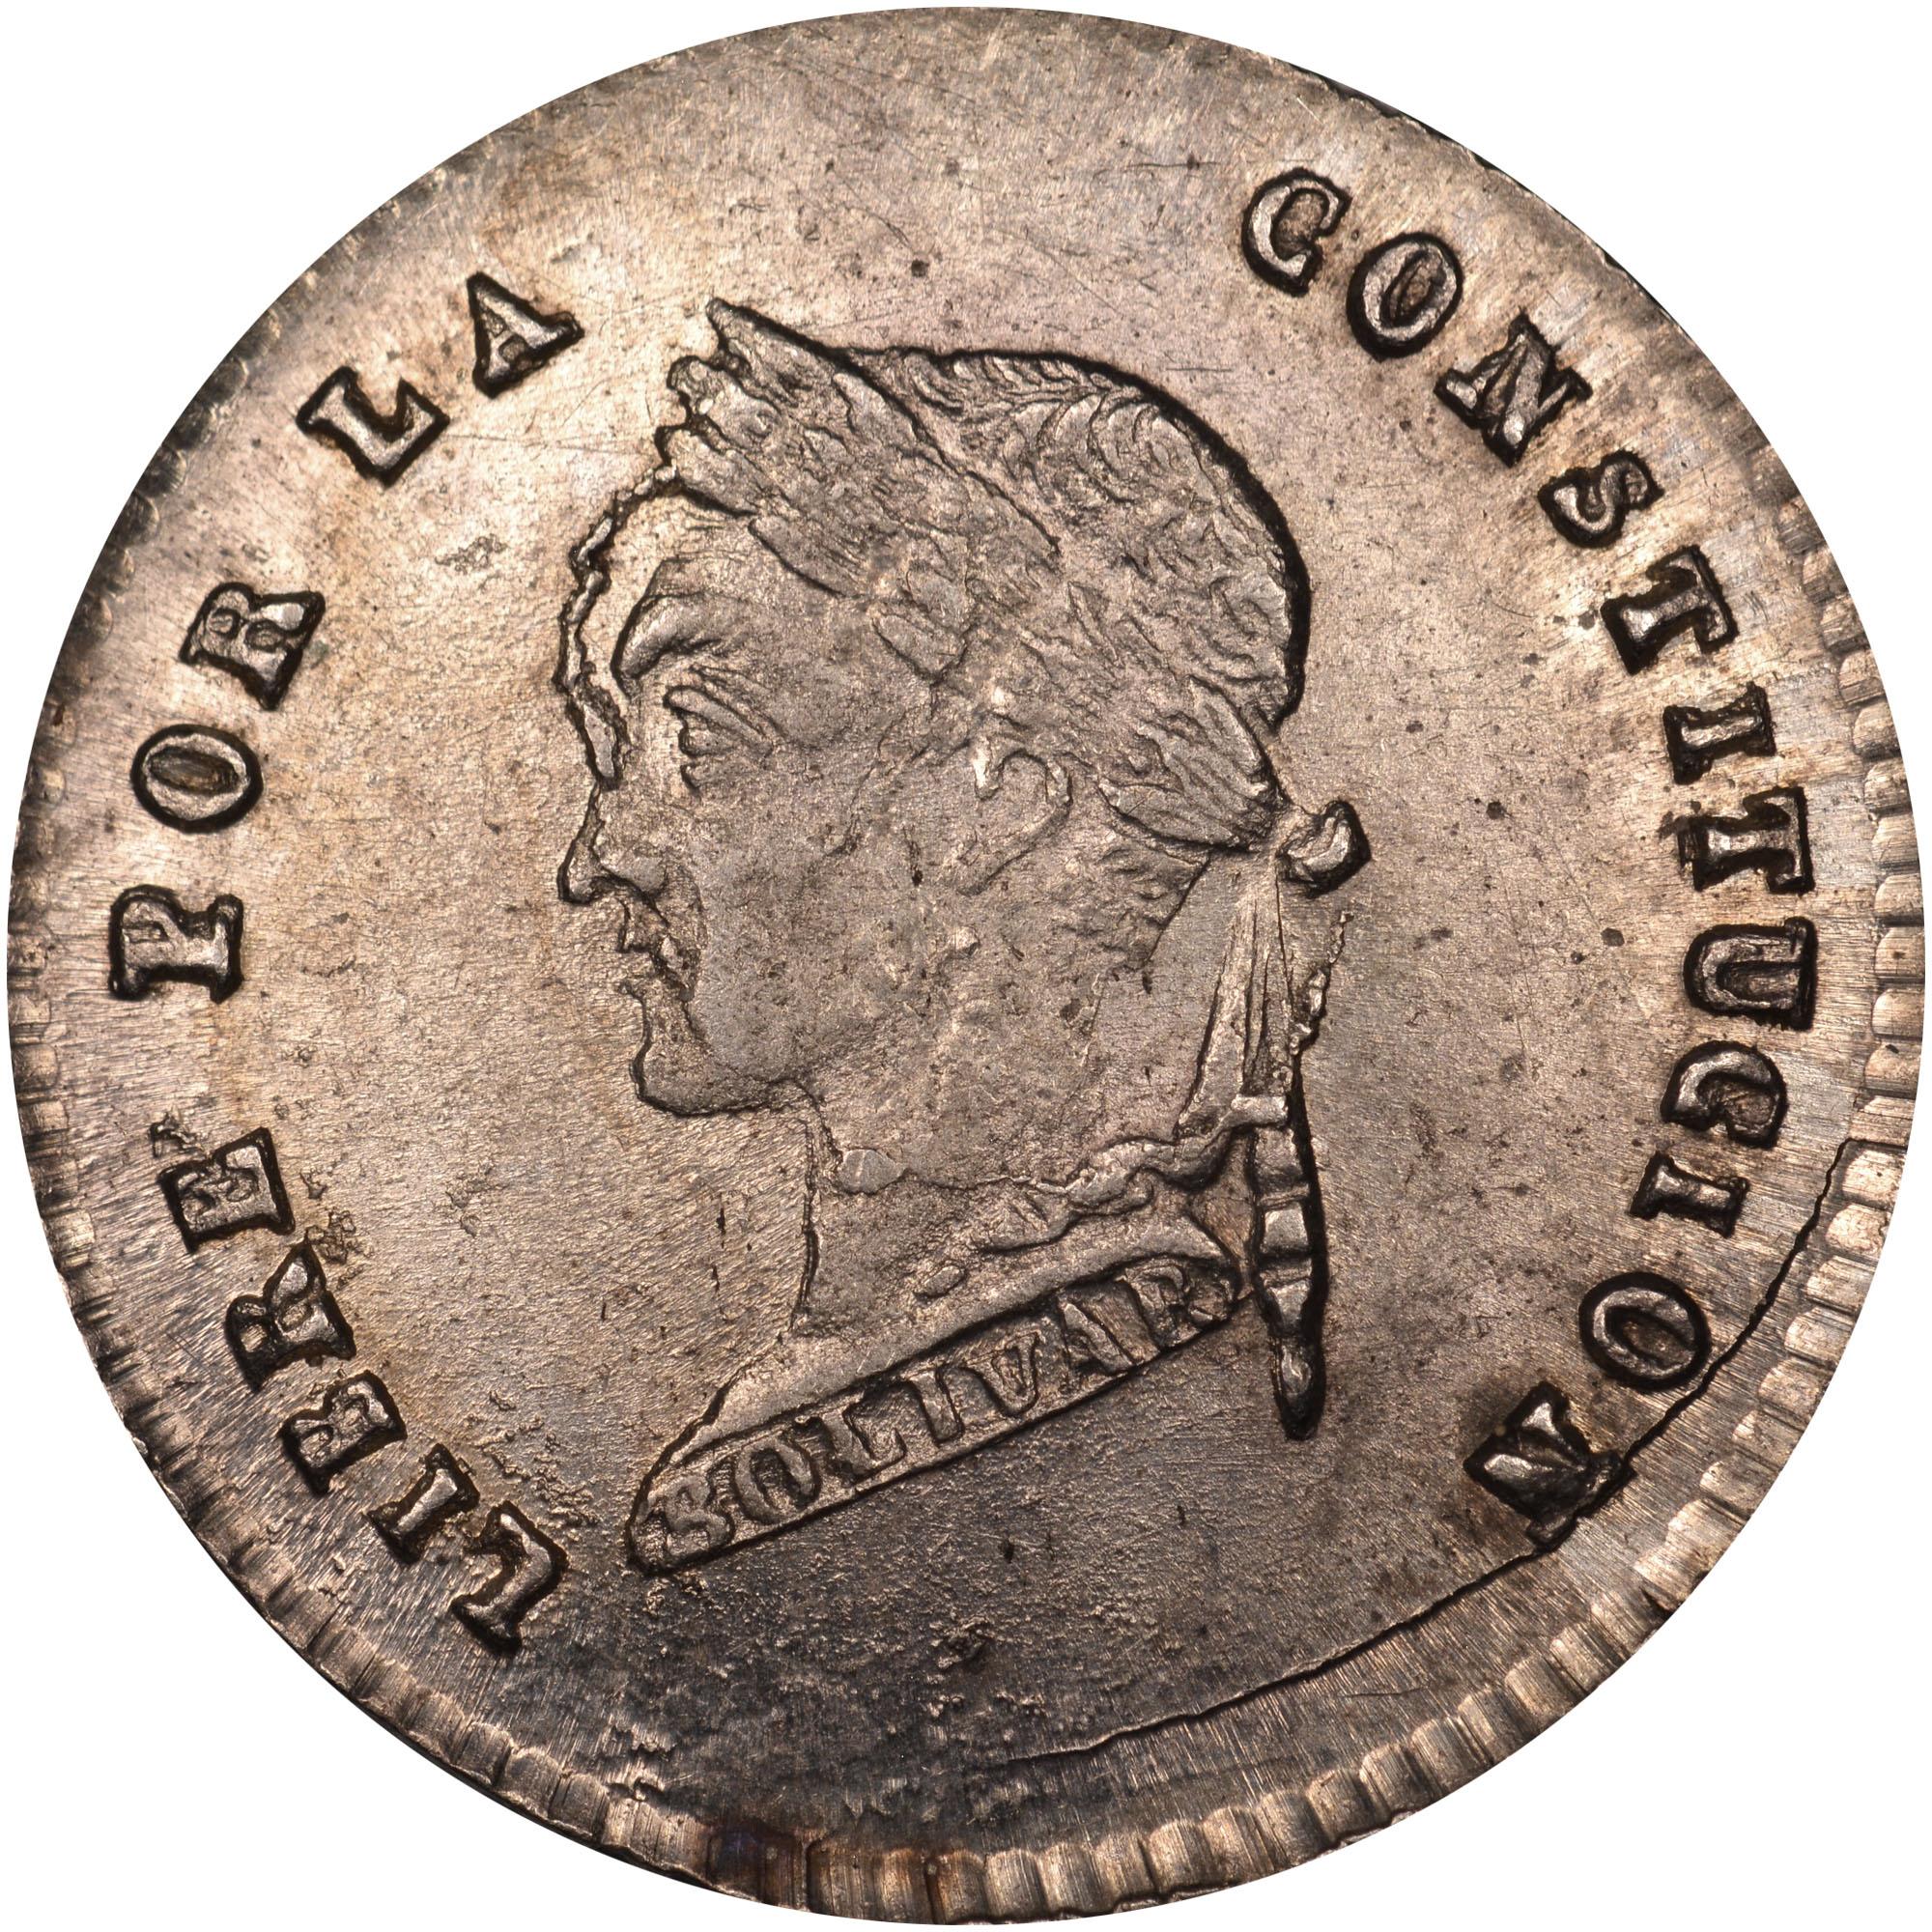 1853-1856 Bolivia 1/2 Sol reverse